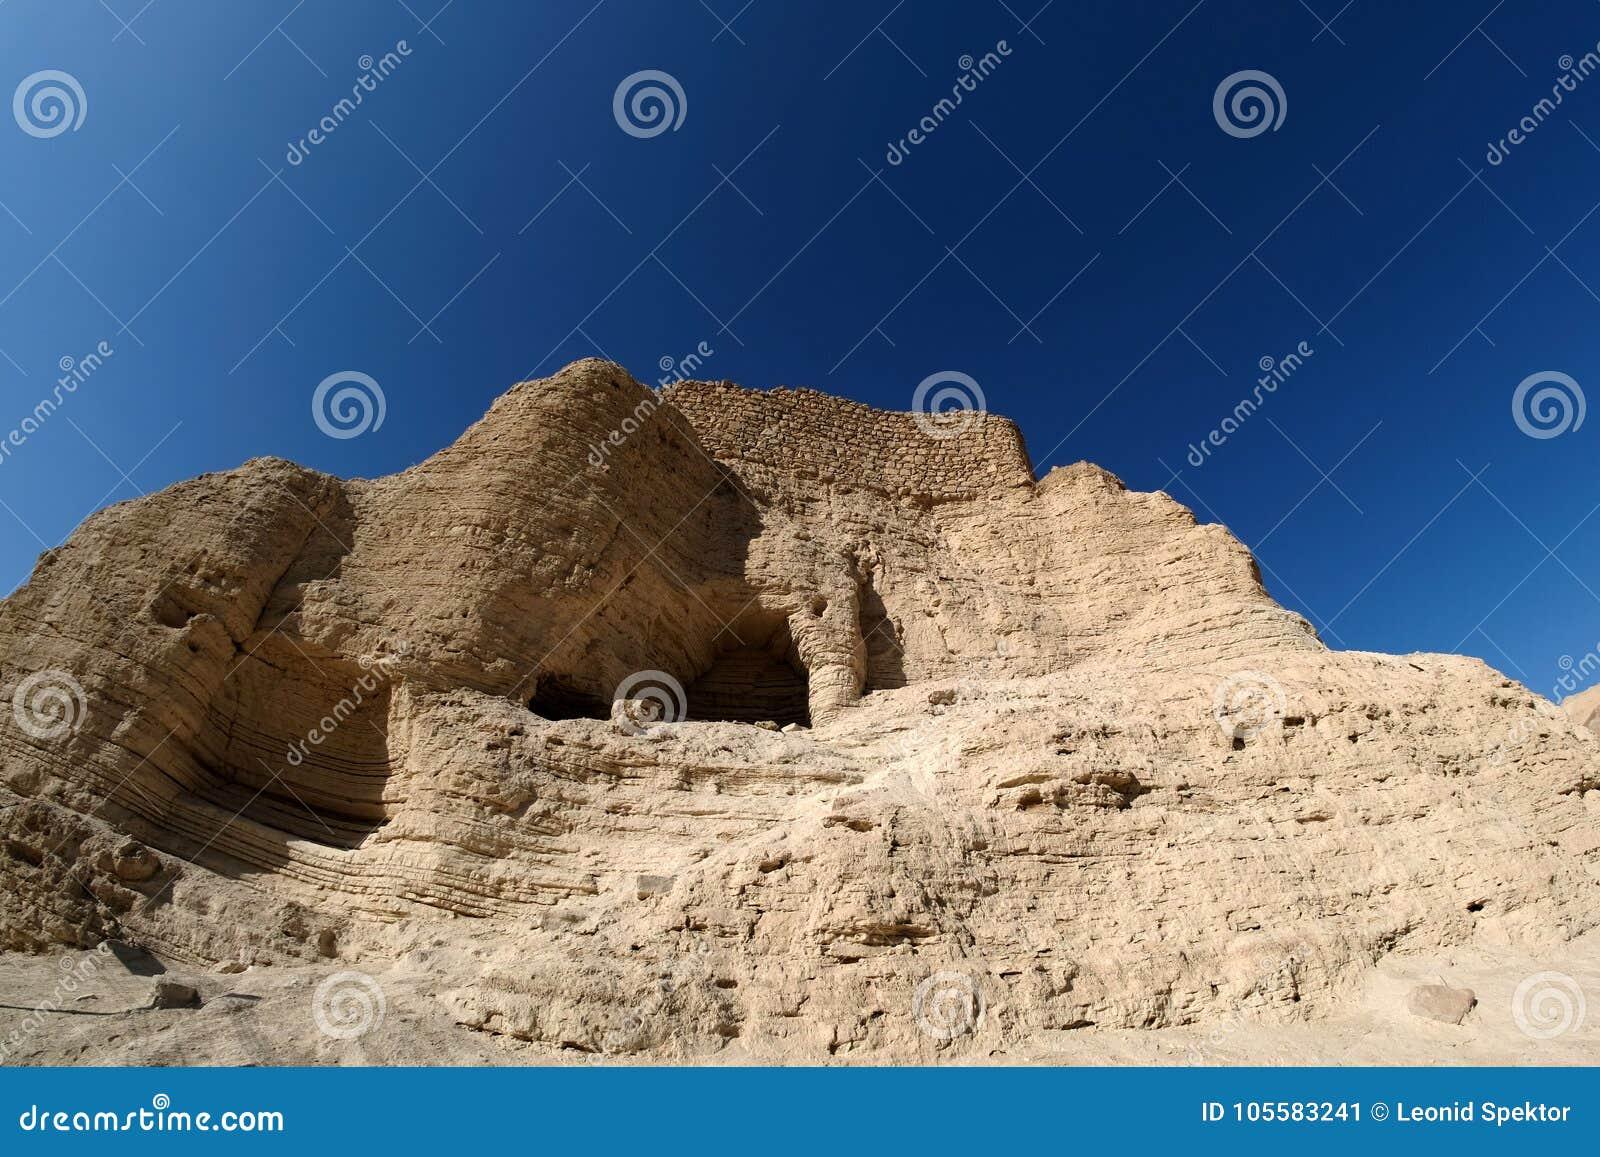 Zohar fortress in Judea desert.